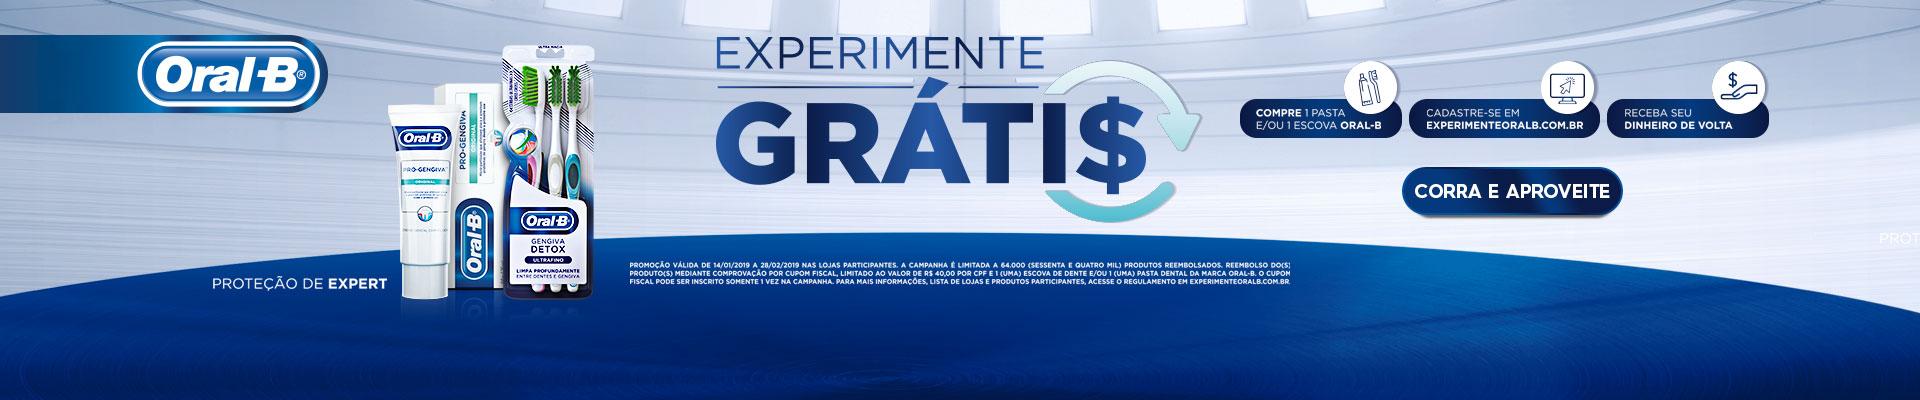 ORAL B EXPERIMENTE GRATIS